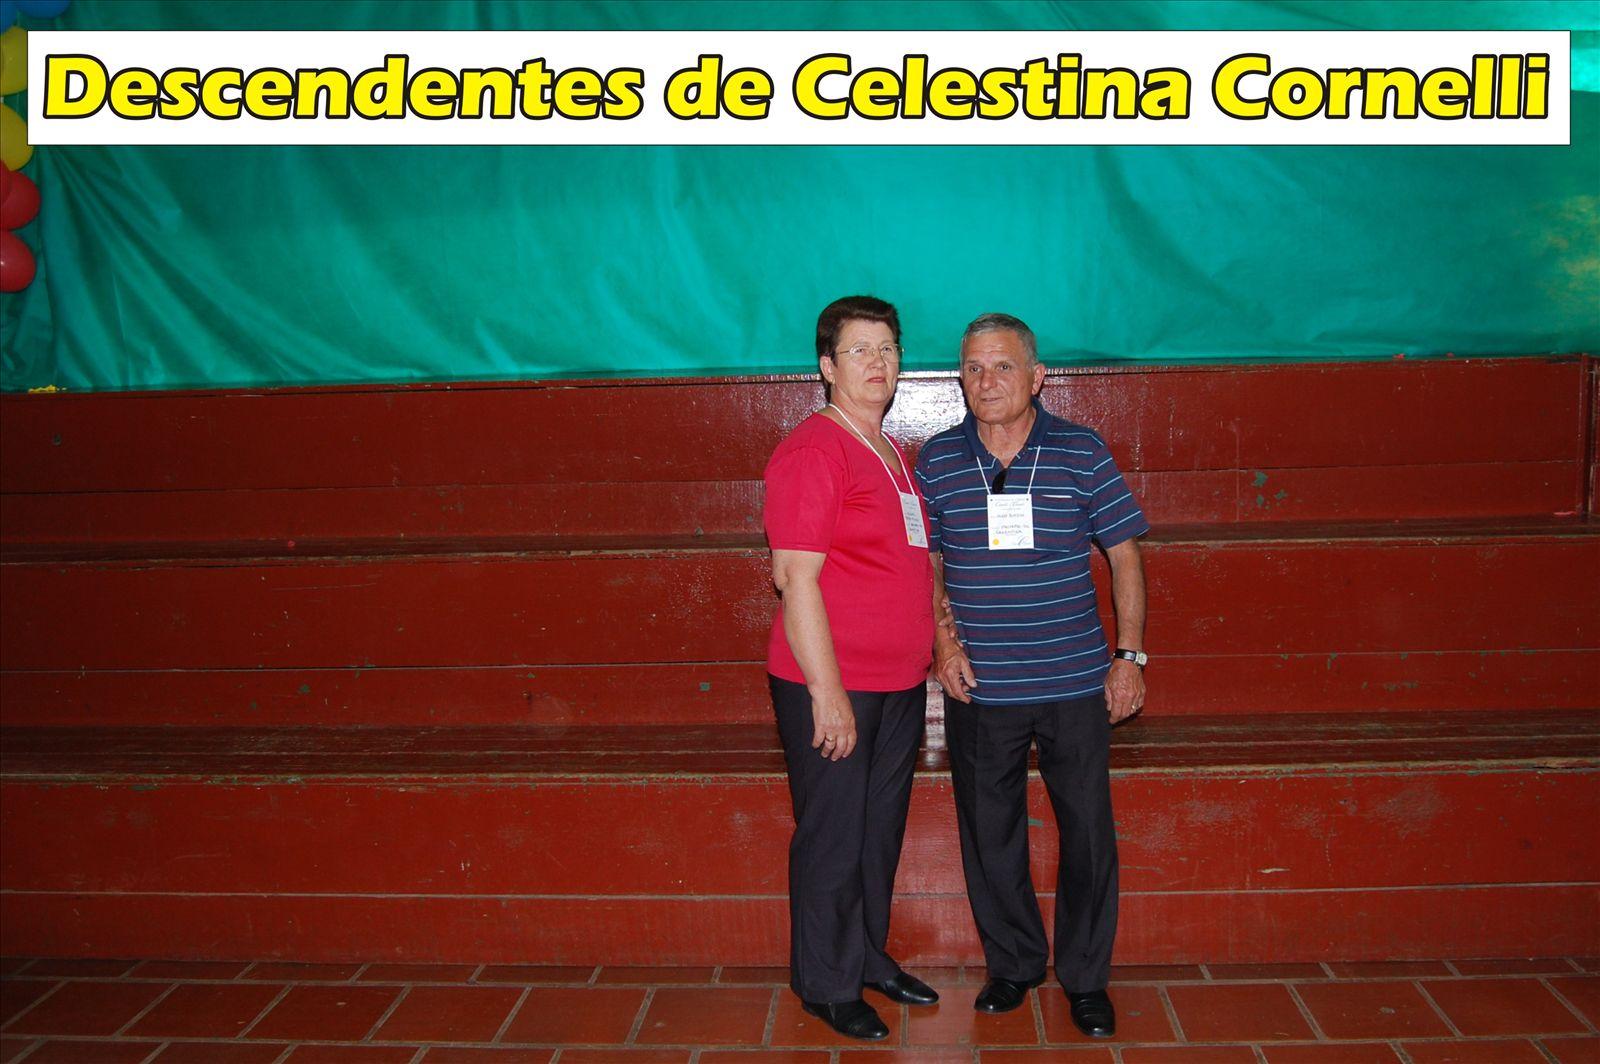 Descendentes de Celestina Cornelli 02_0